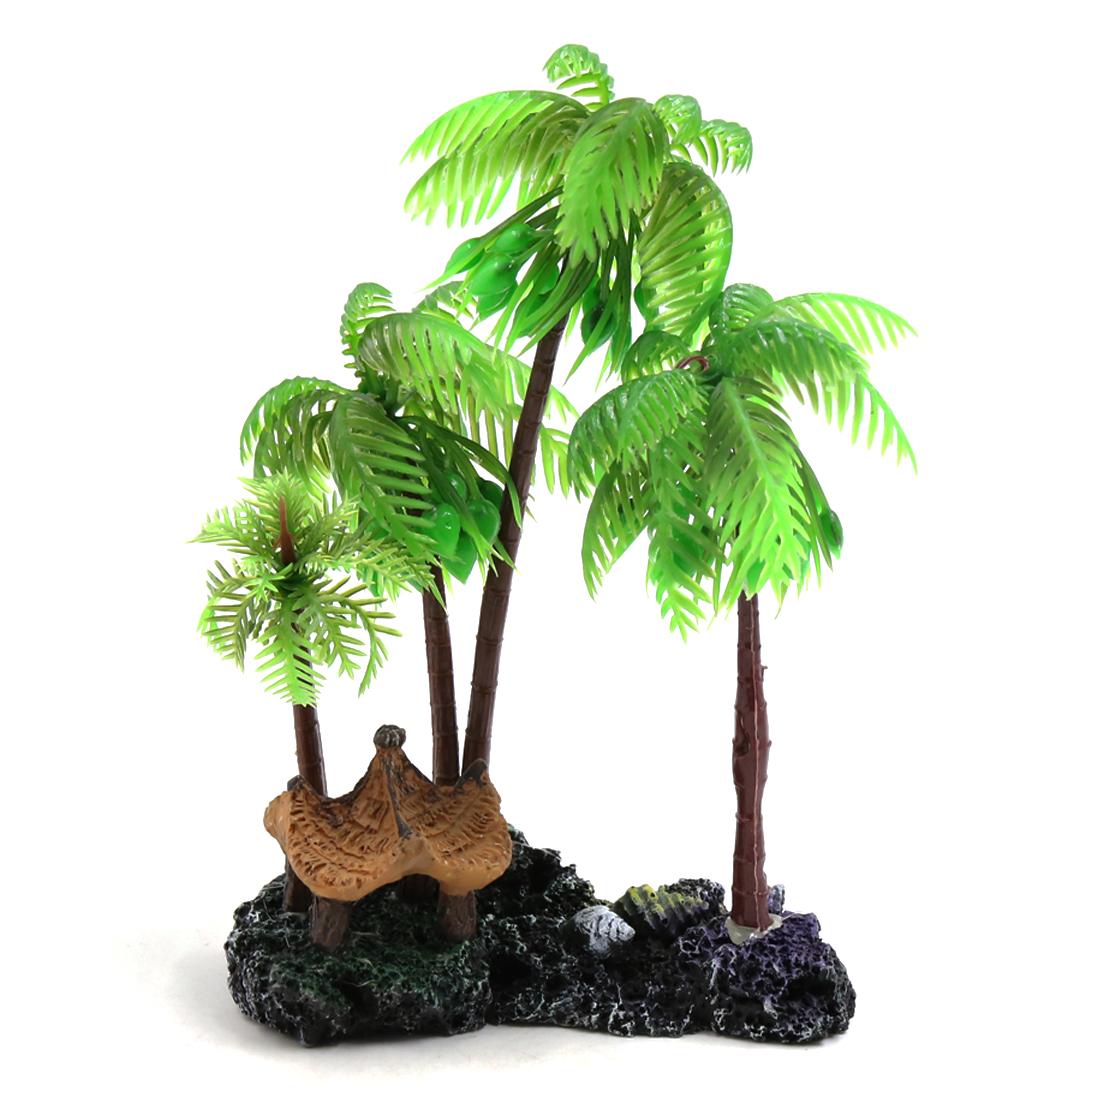 Green Plastic Coconut Tree Plant Decors Ornament for Reptiles Amphibians